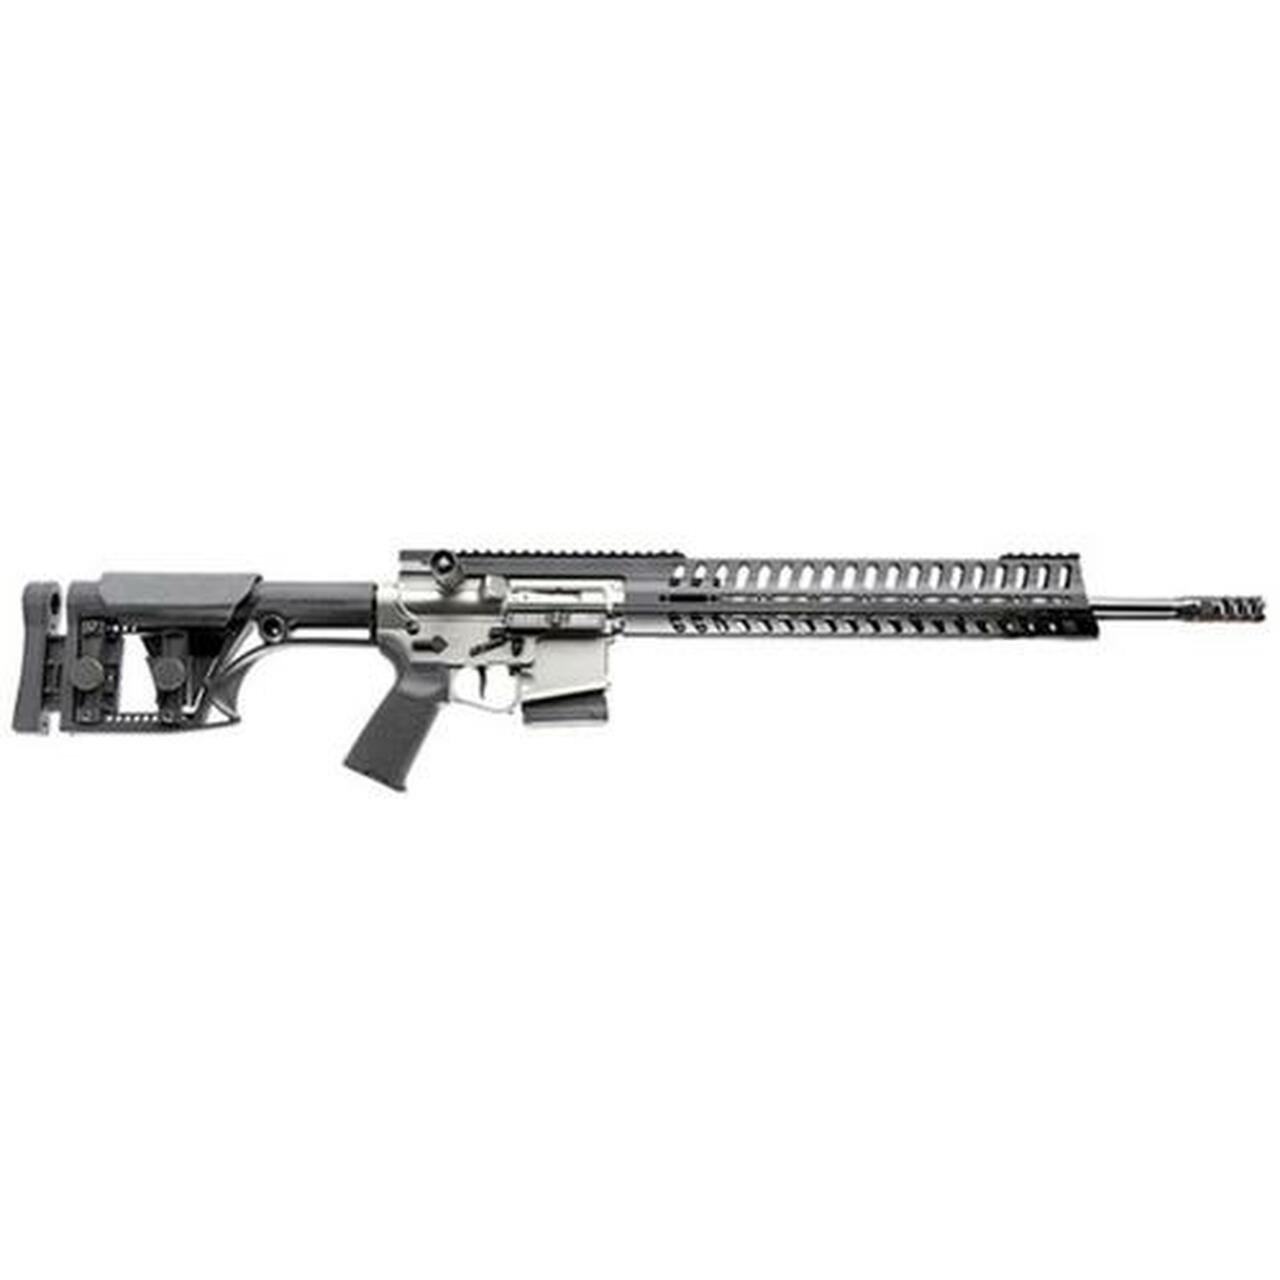 "Image of POF Rifles G4 ReVolt .308, 18"" Barrel, NP3 Coating, Luth AR Stock, 10rd CA Legal"